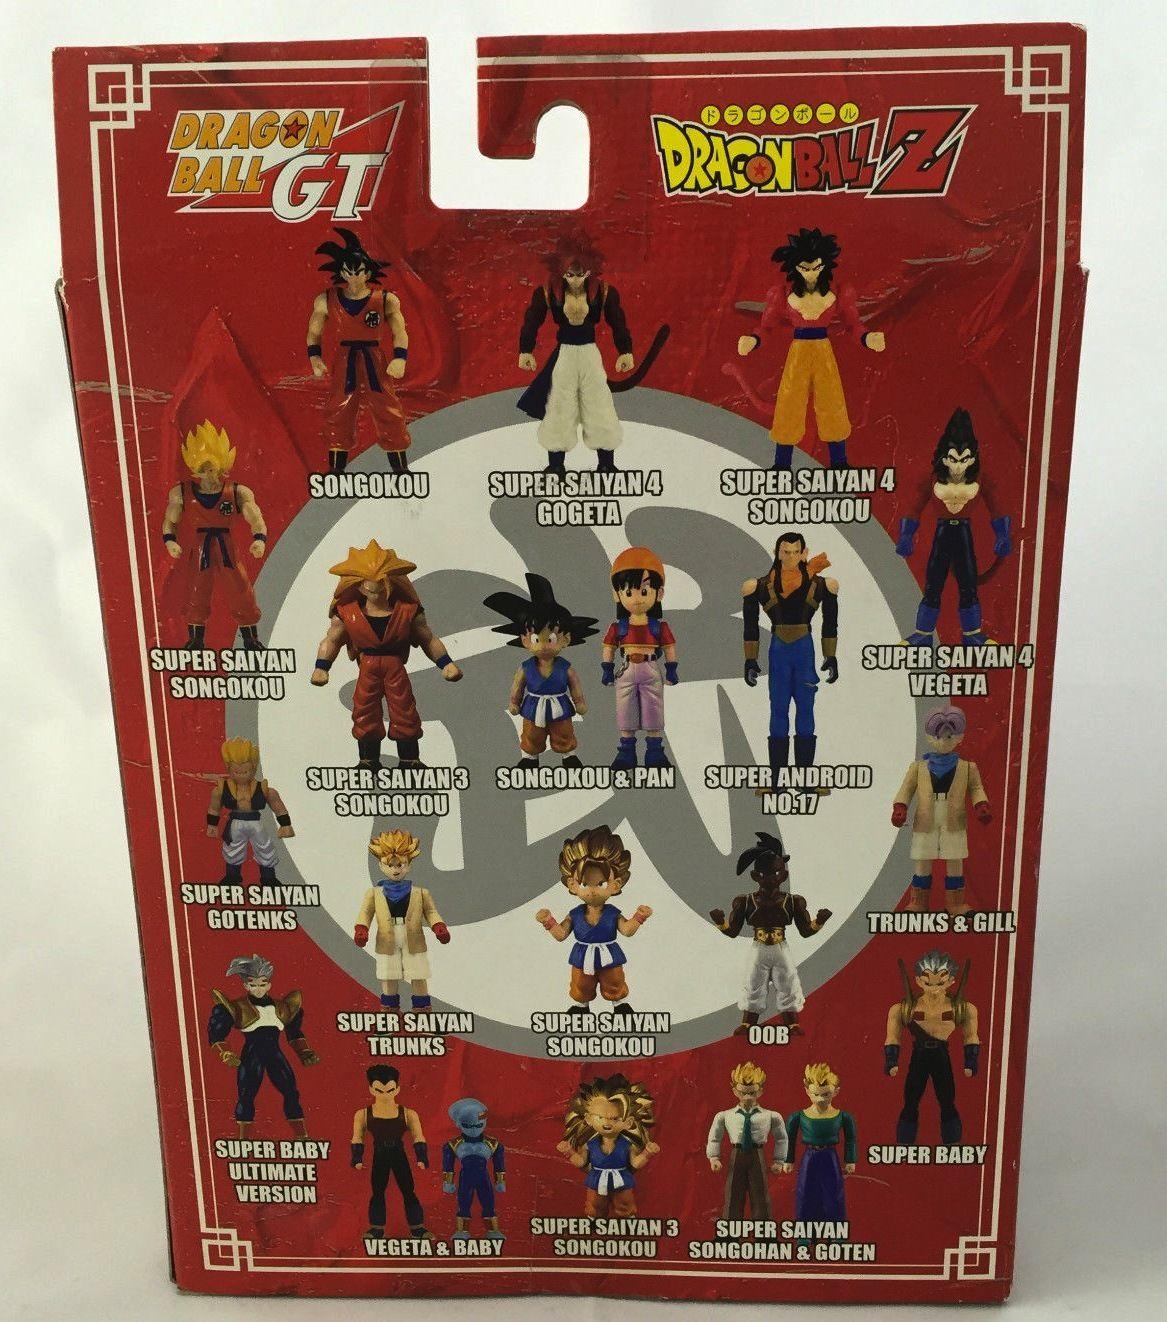 Super Battle Collection – Super Saiyan 3 Son Gokou (2003 Re-Release)